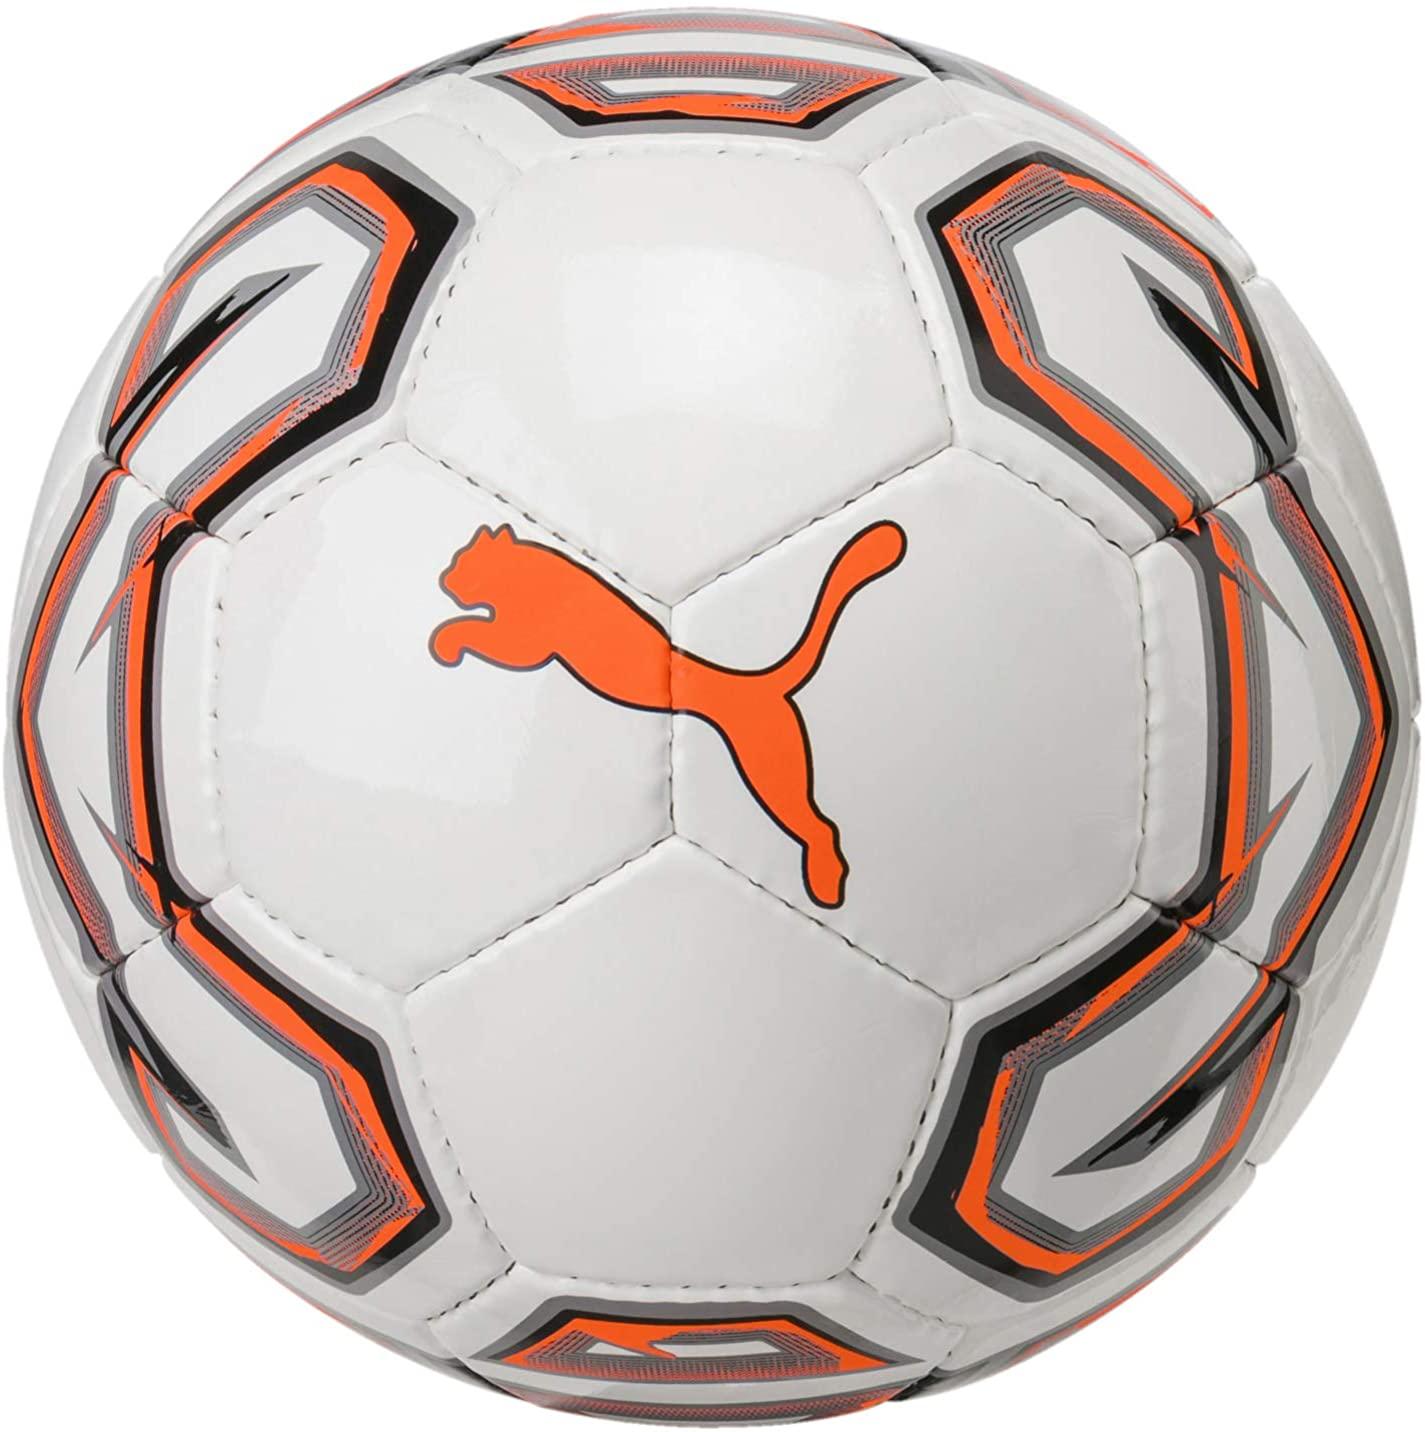 PUMA - Mens Futsal 1 Trainer